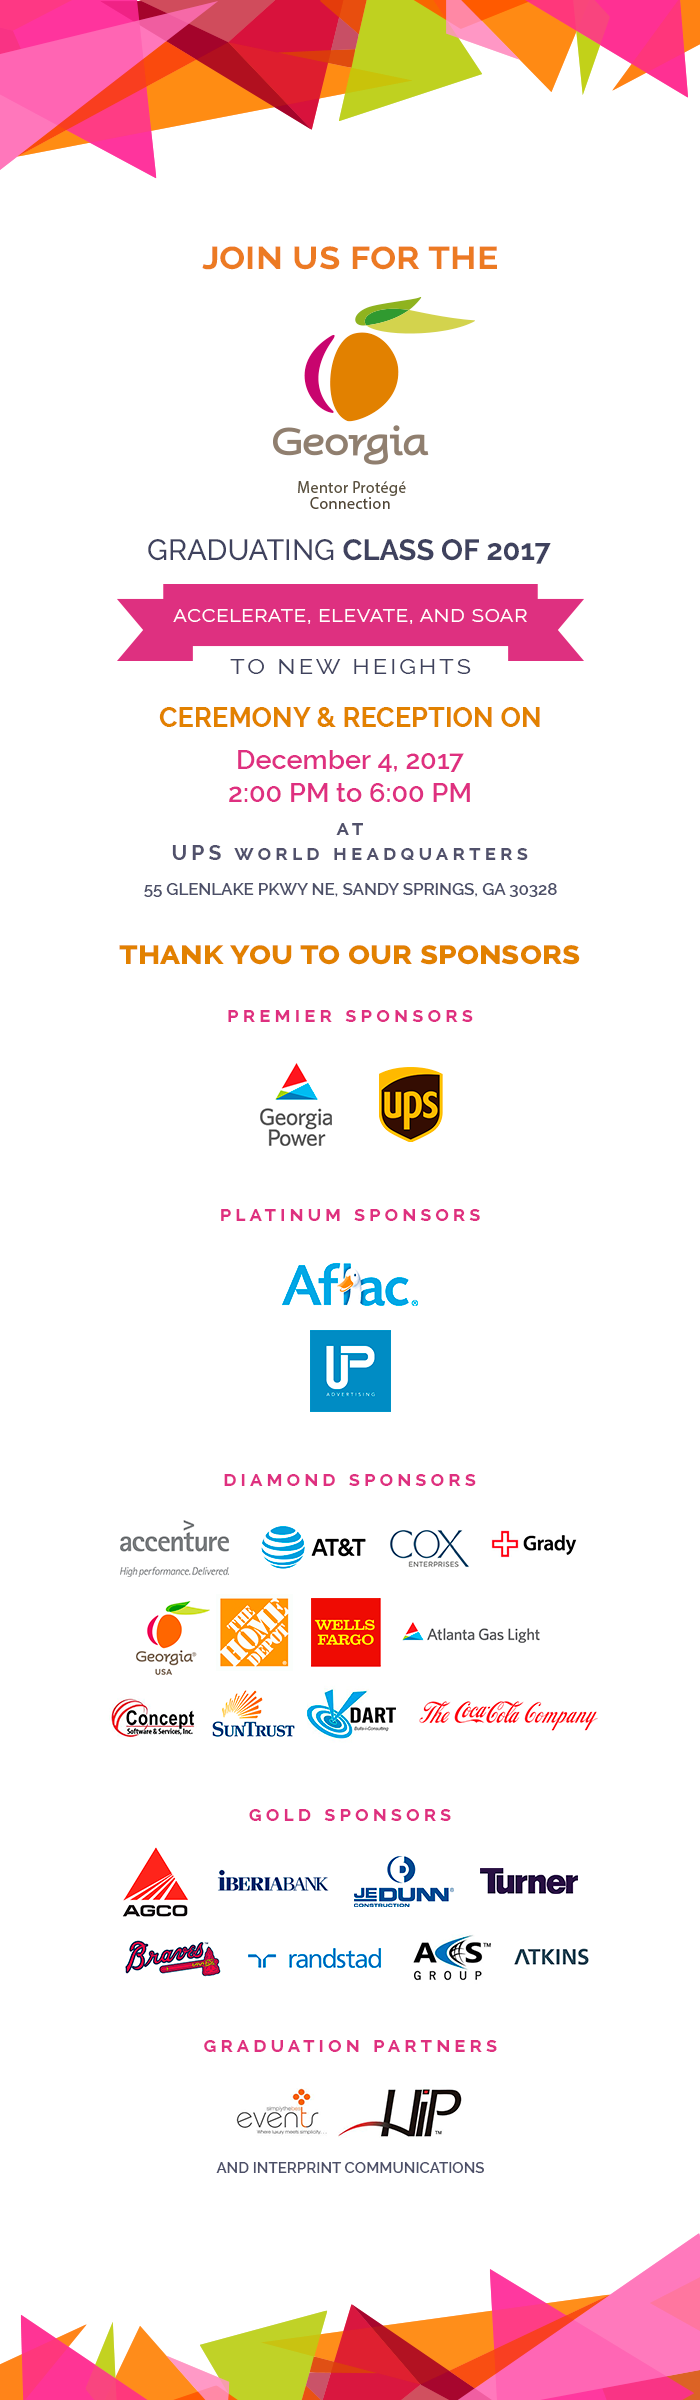 GMPC 2017 Graduation Sponsors